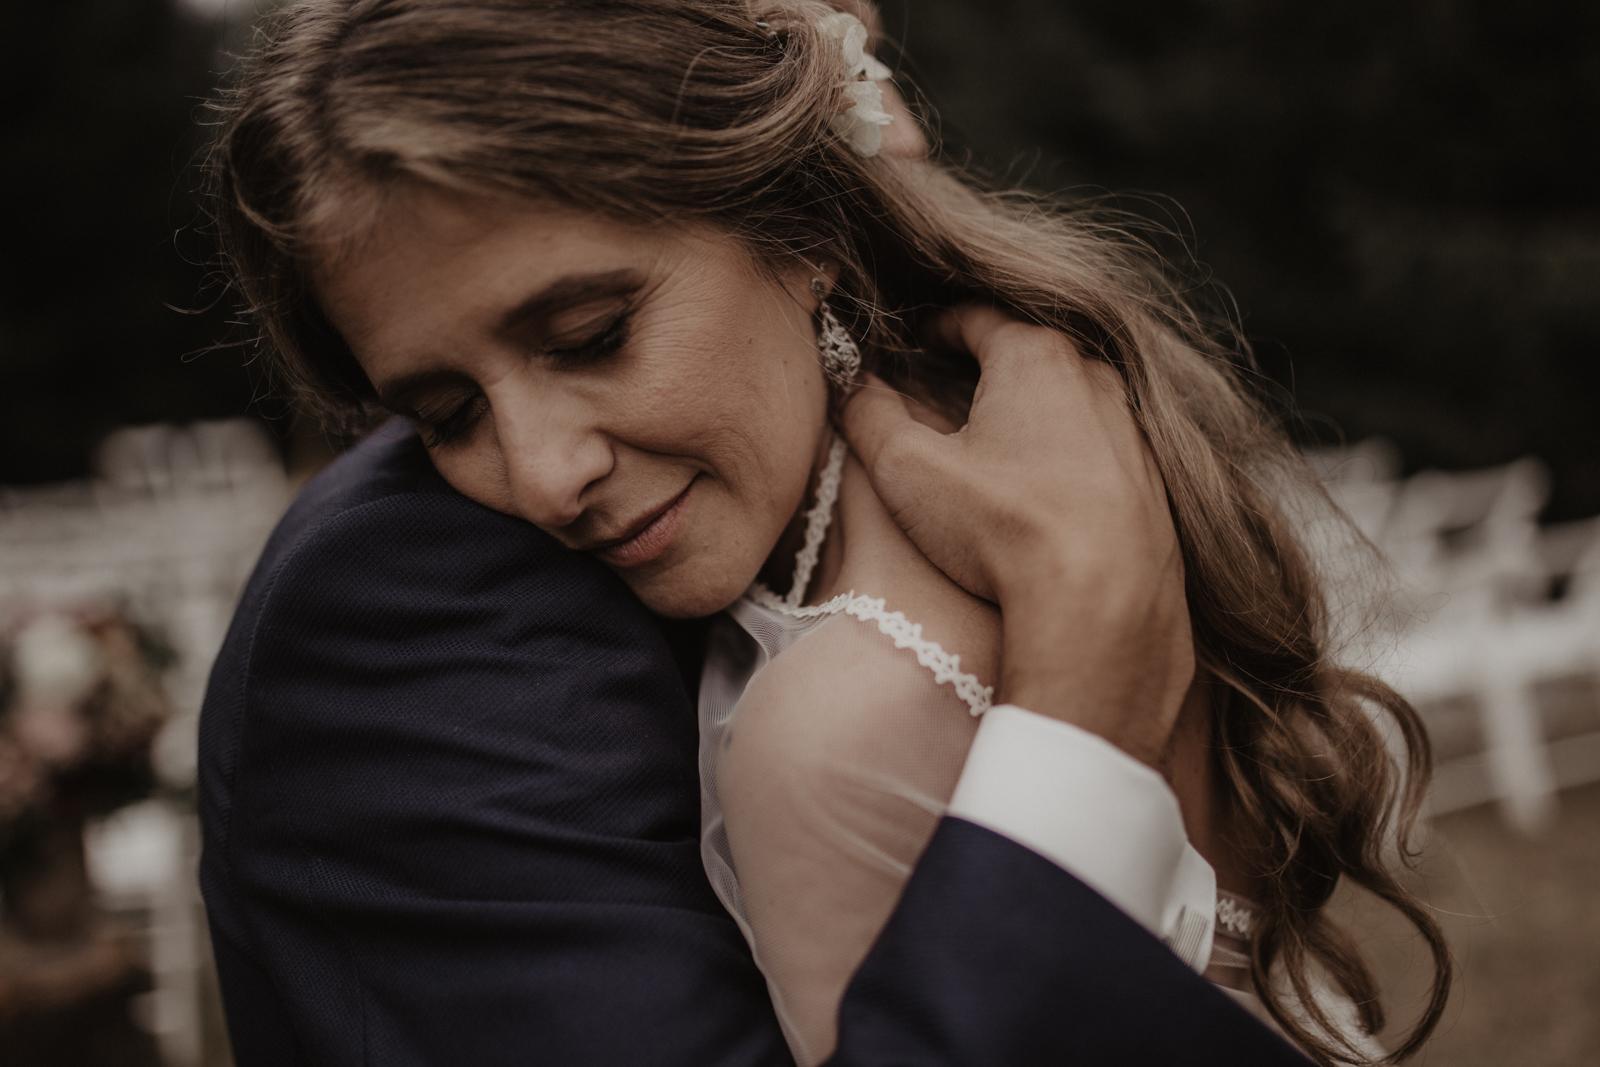 thenortherngirlphotography_photography_thenortherngirl_rebeccascabros_wedding_weddingphotography_weddingphotographer_barcelona_bodaenbarcelona_bodaenmaselmarti_bodarogeryvane-526.jpg